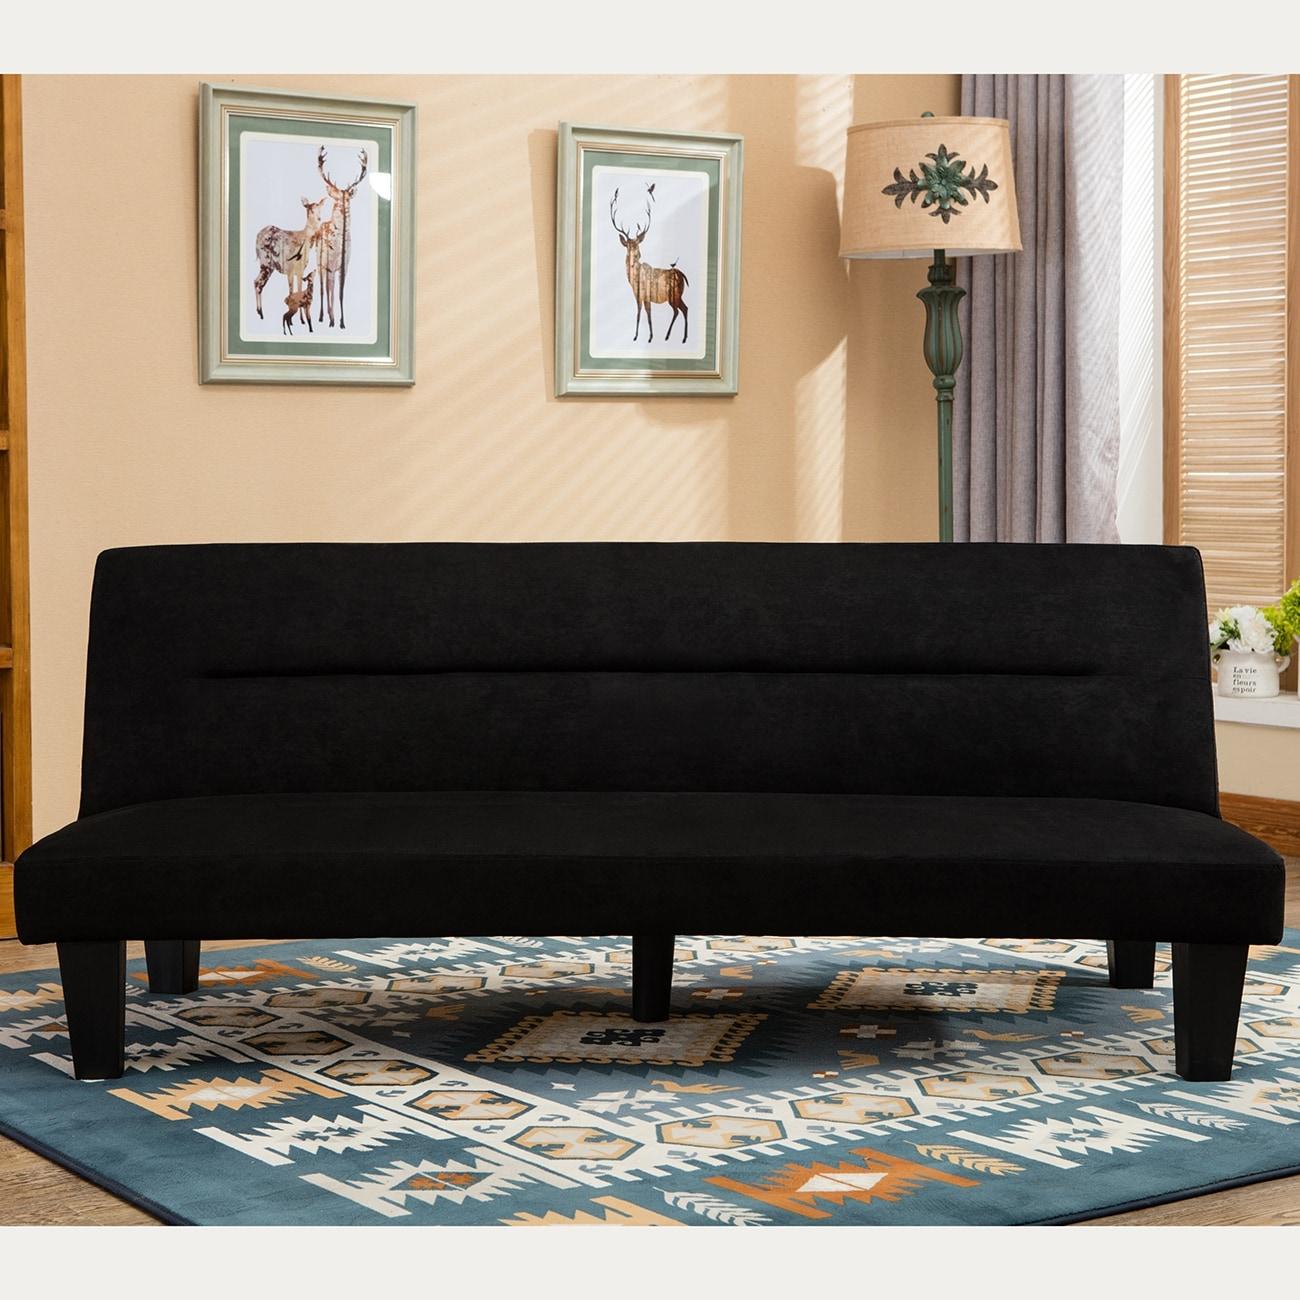 Belleze Premium Convertible Sofa Futon Microfiber Couch Bed Legs Multifunctional Adjule Black